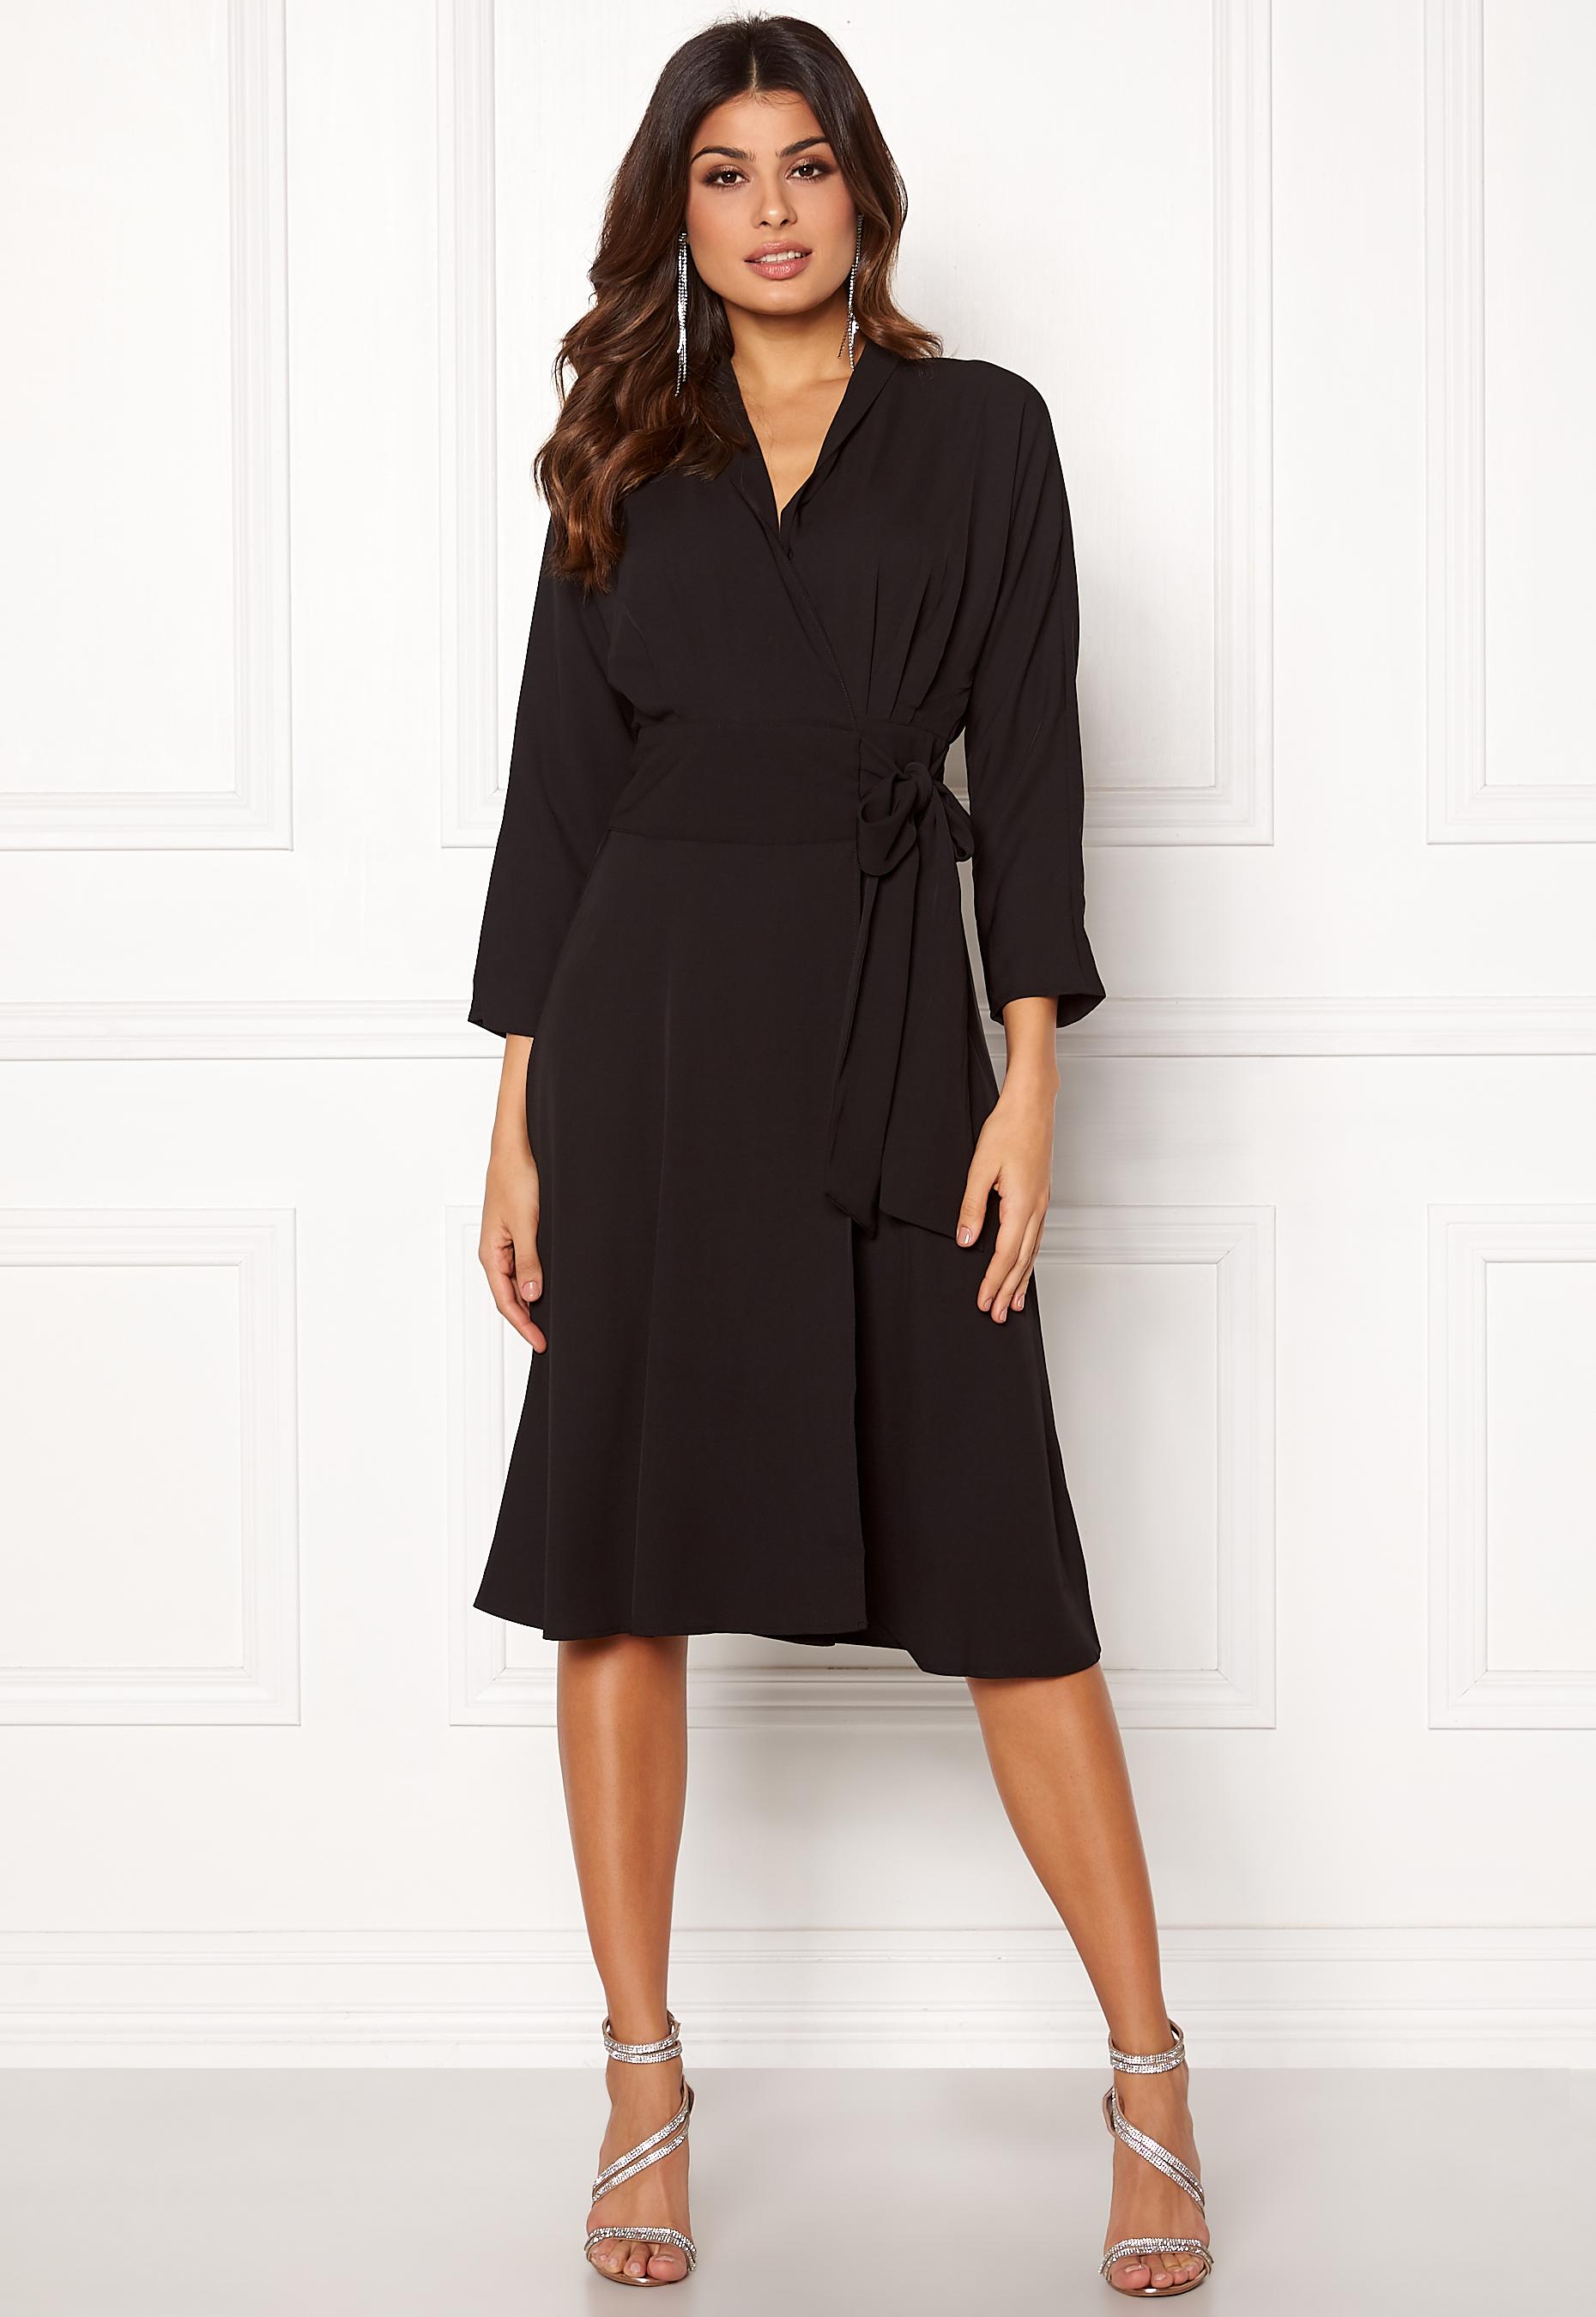 Y Black Unika Dress Ls a s Bubbleroom nwk0OP8X